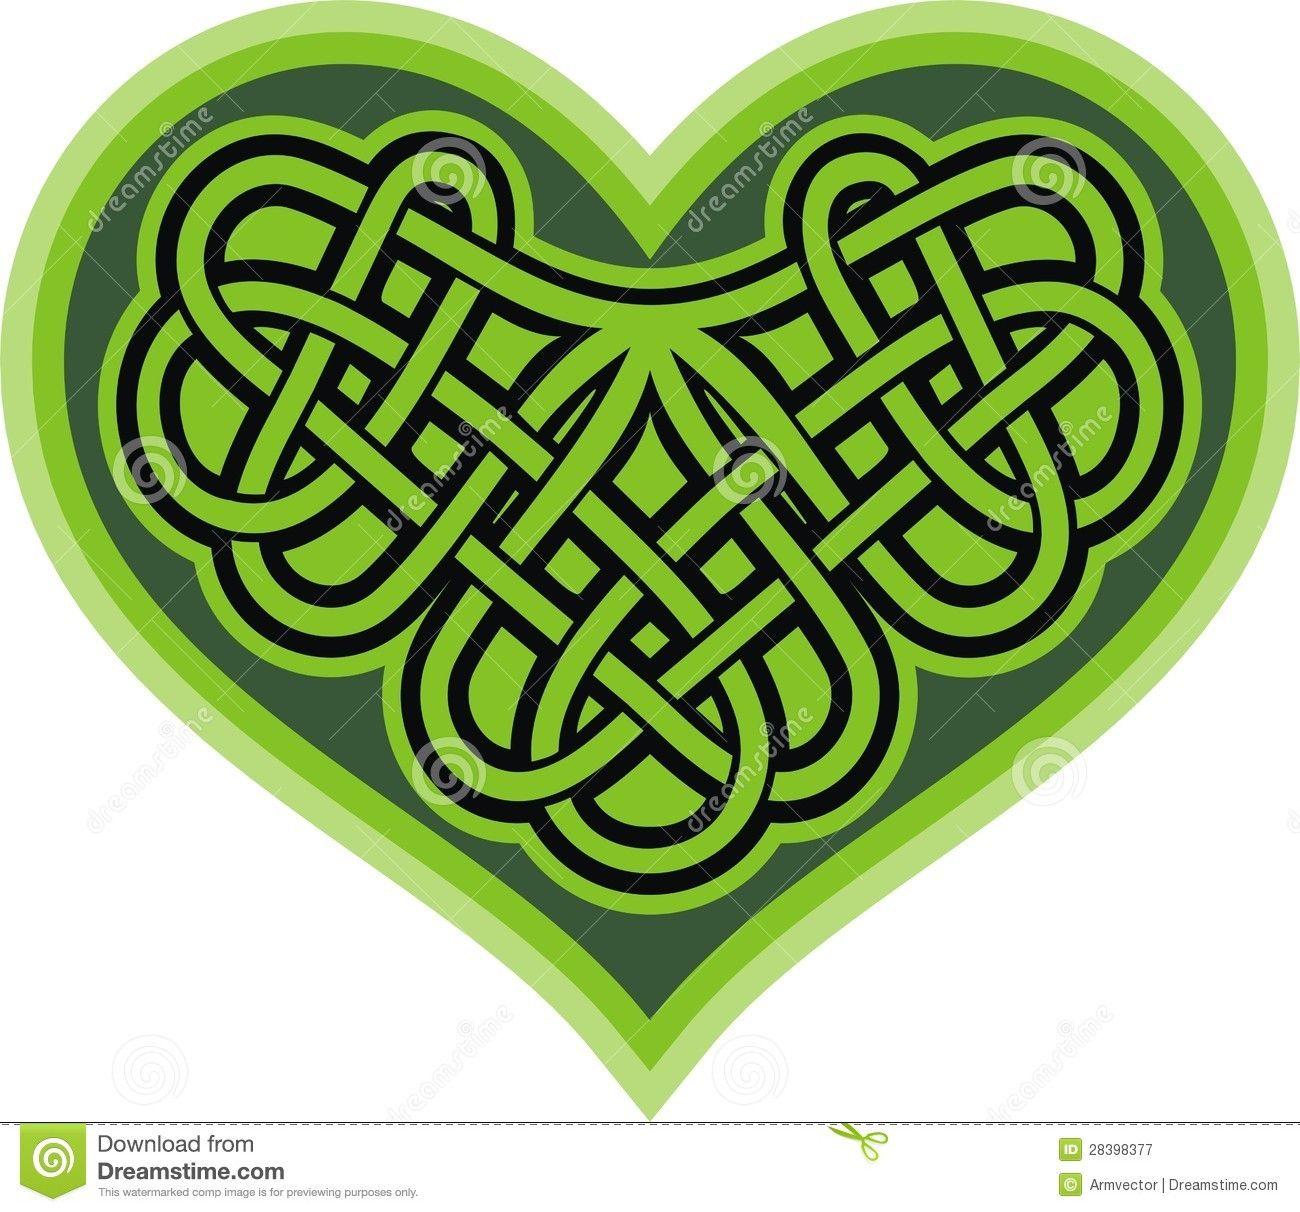 irish heart knot symbol google search wedding invites